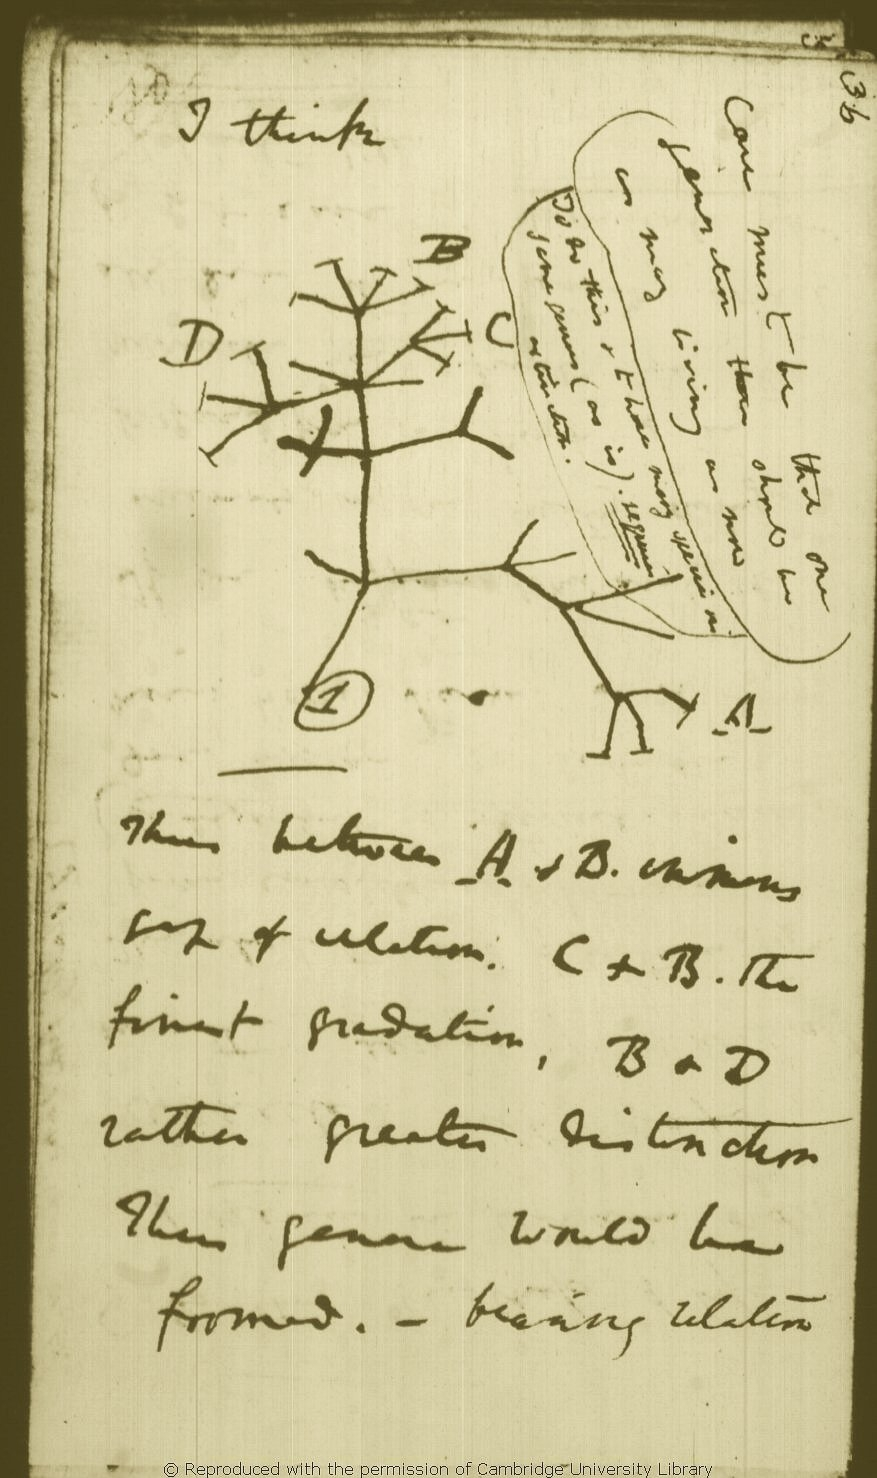 Personajes: Charles Darwin